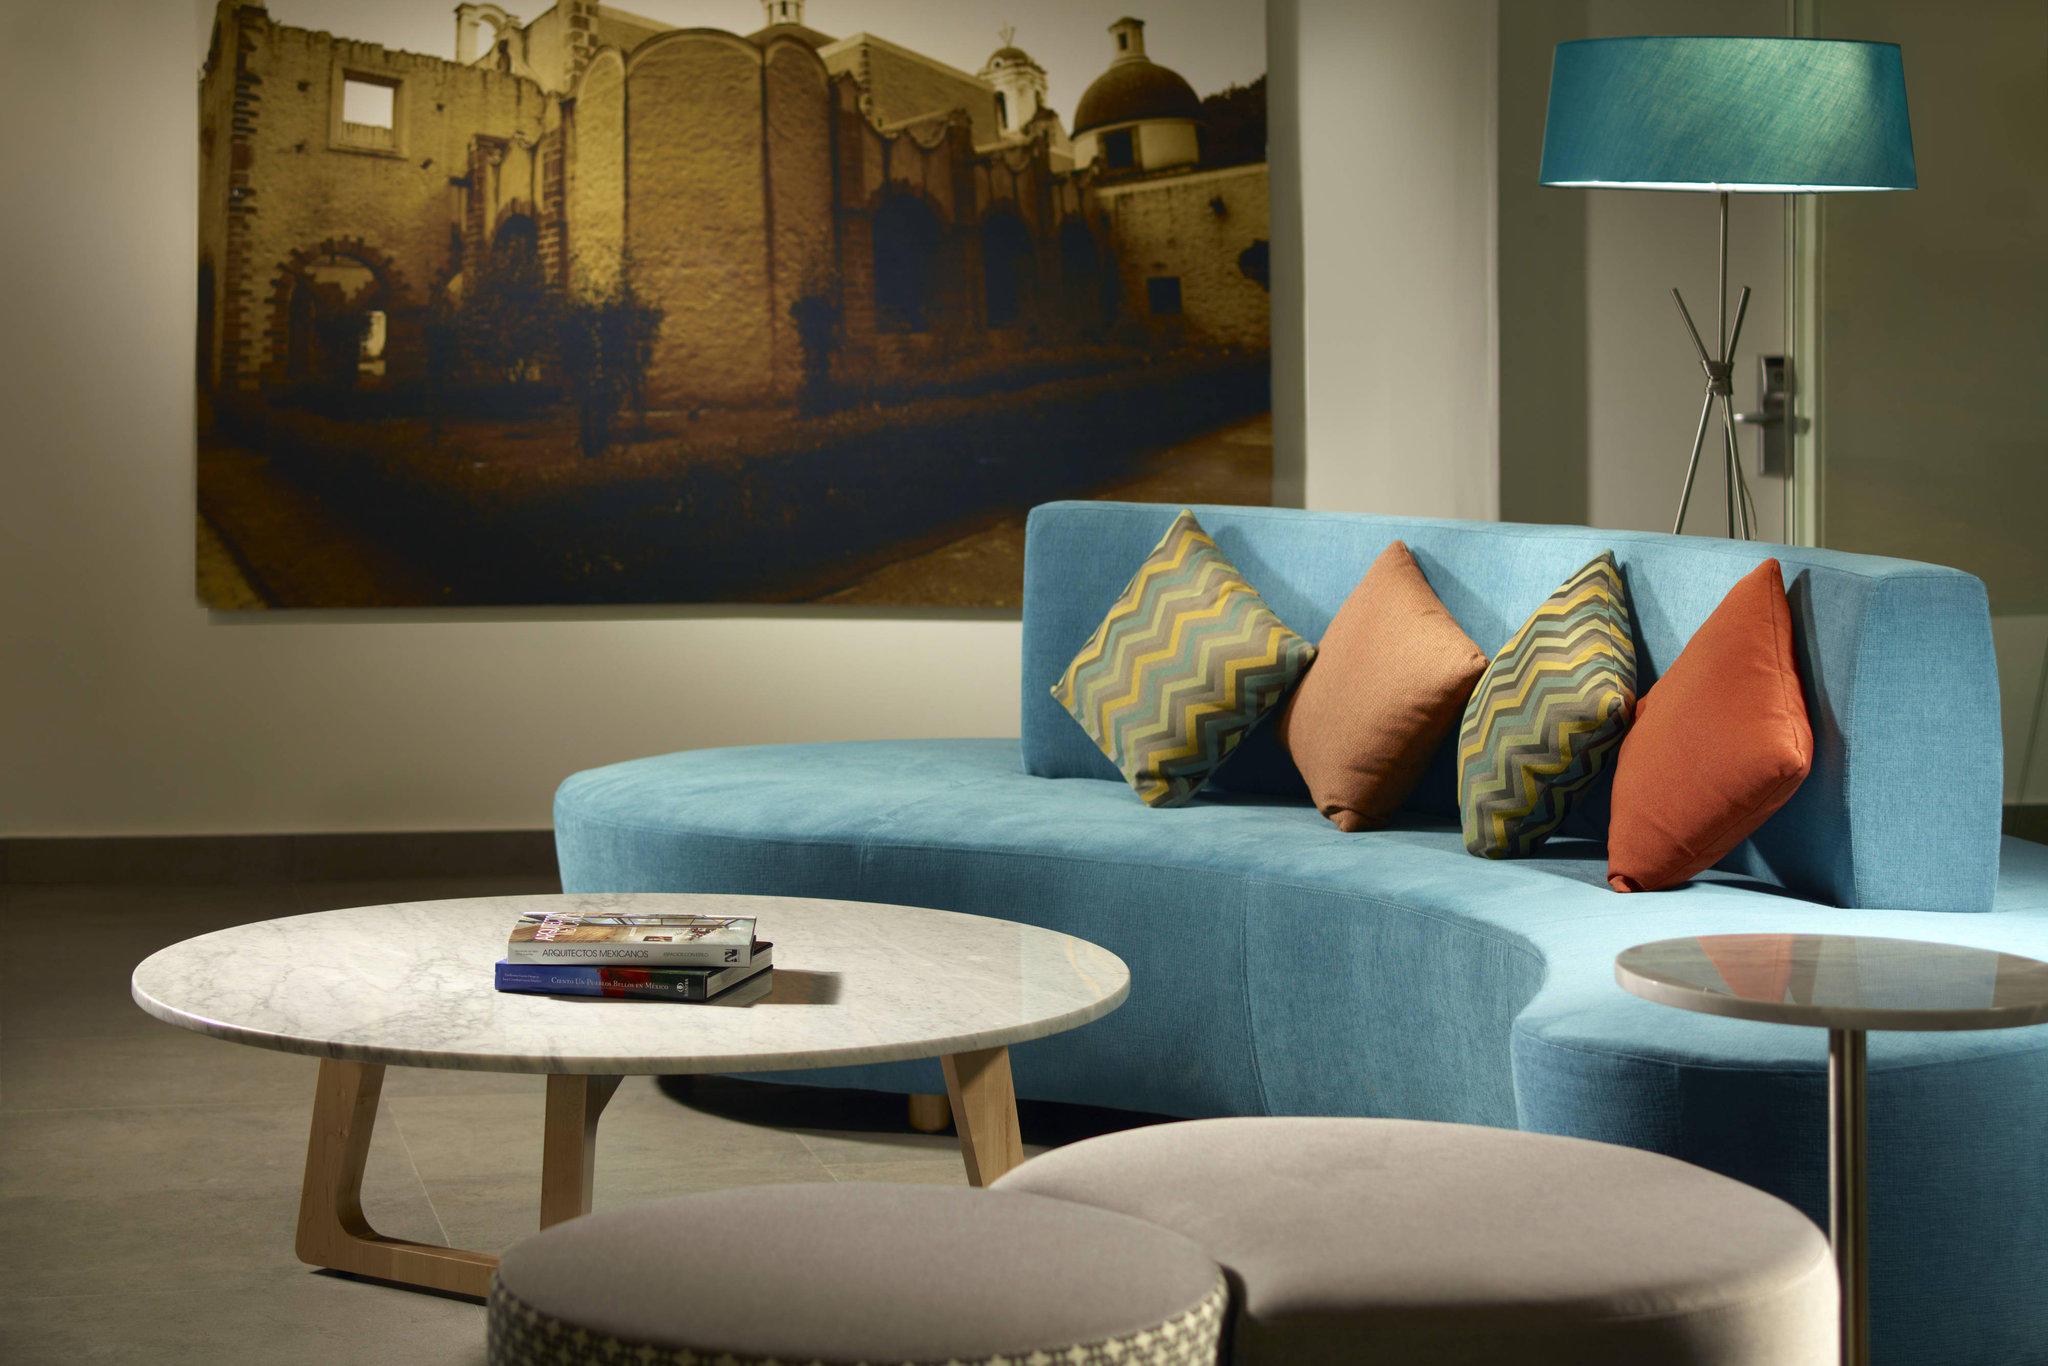 Fairfield Inn & Suites by Marriott Saltillo